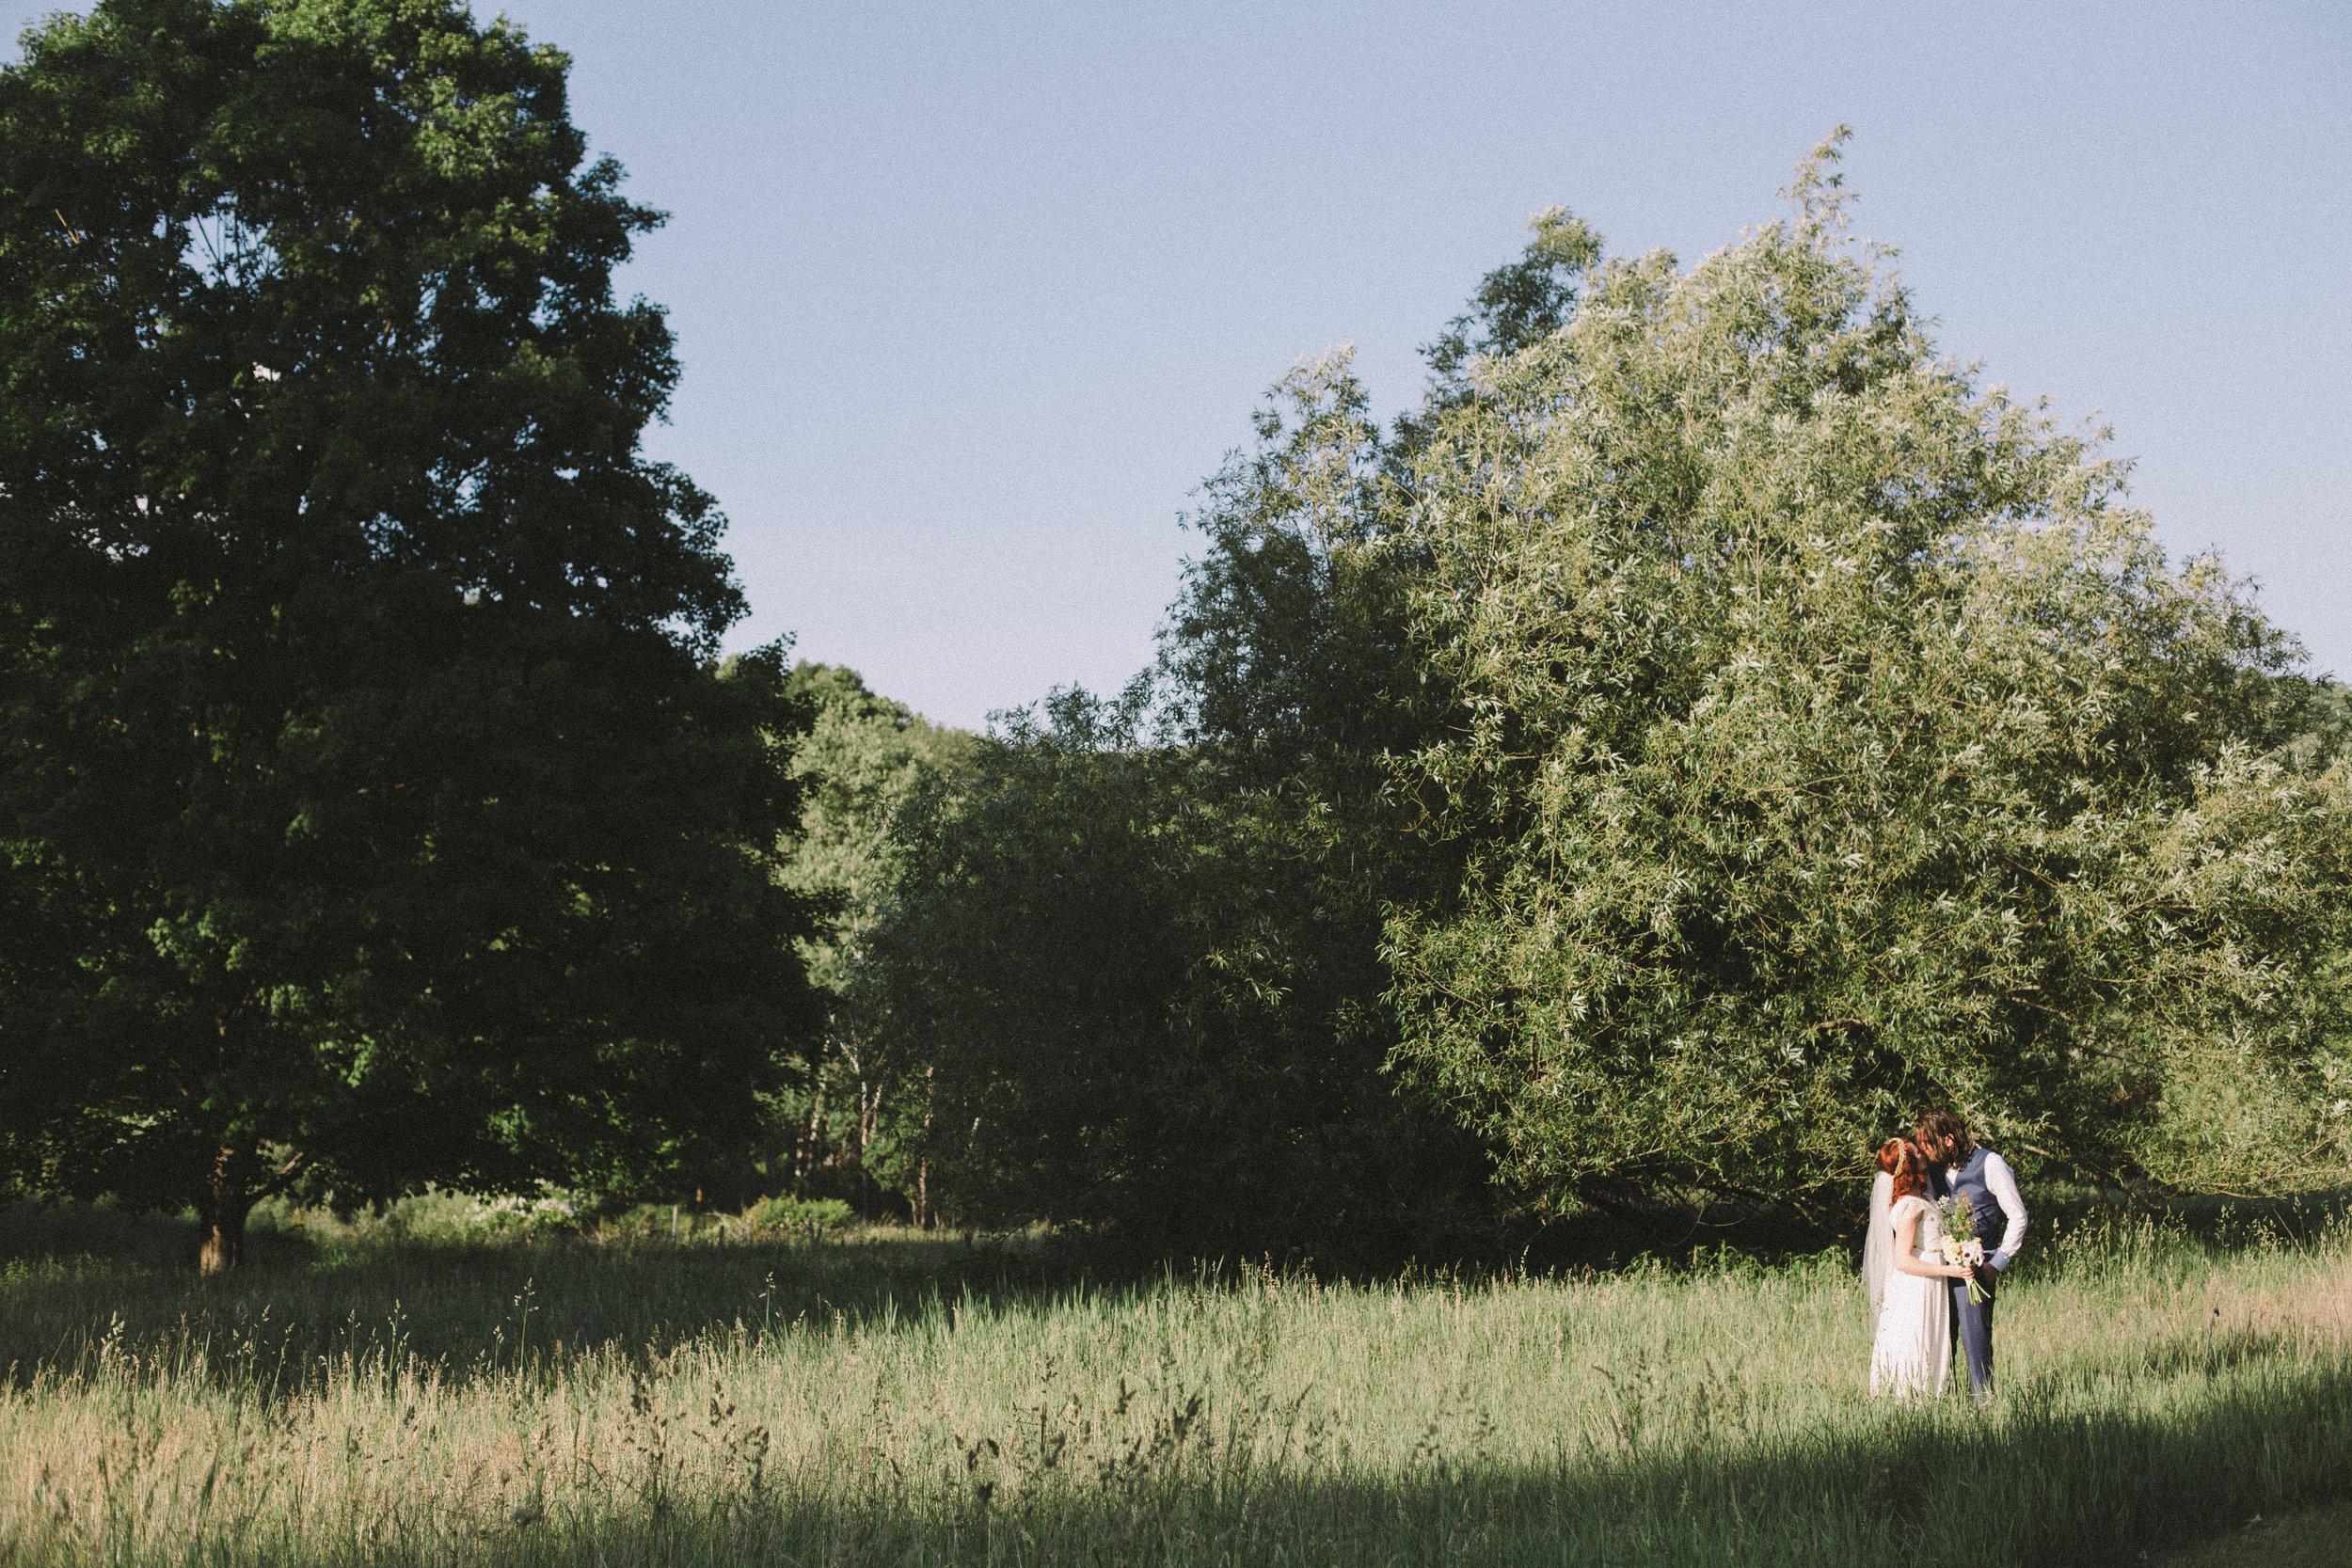 NorthBranchInn_Catskills_UpstateNewYork__Farmtotable_WeekendEscape_WeekendGetaway_Weddings_Field_CorporateRetreats_CatskillsSummer_CatskillsWinter_CatskillsFall_FosterSupplyHospitality